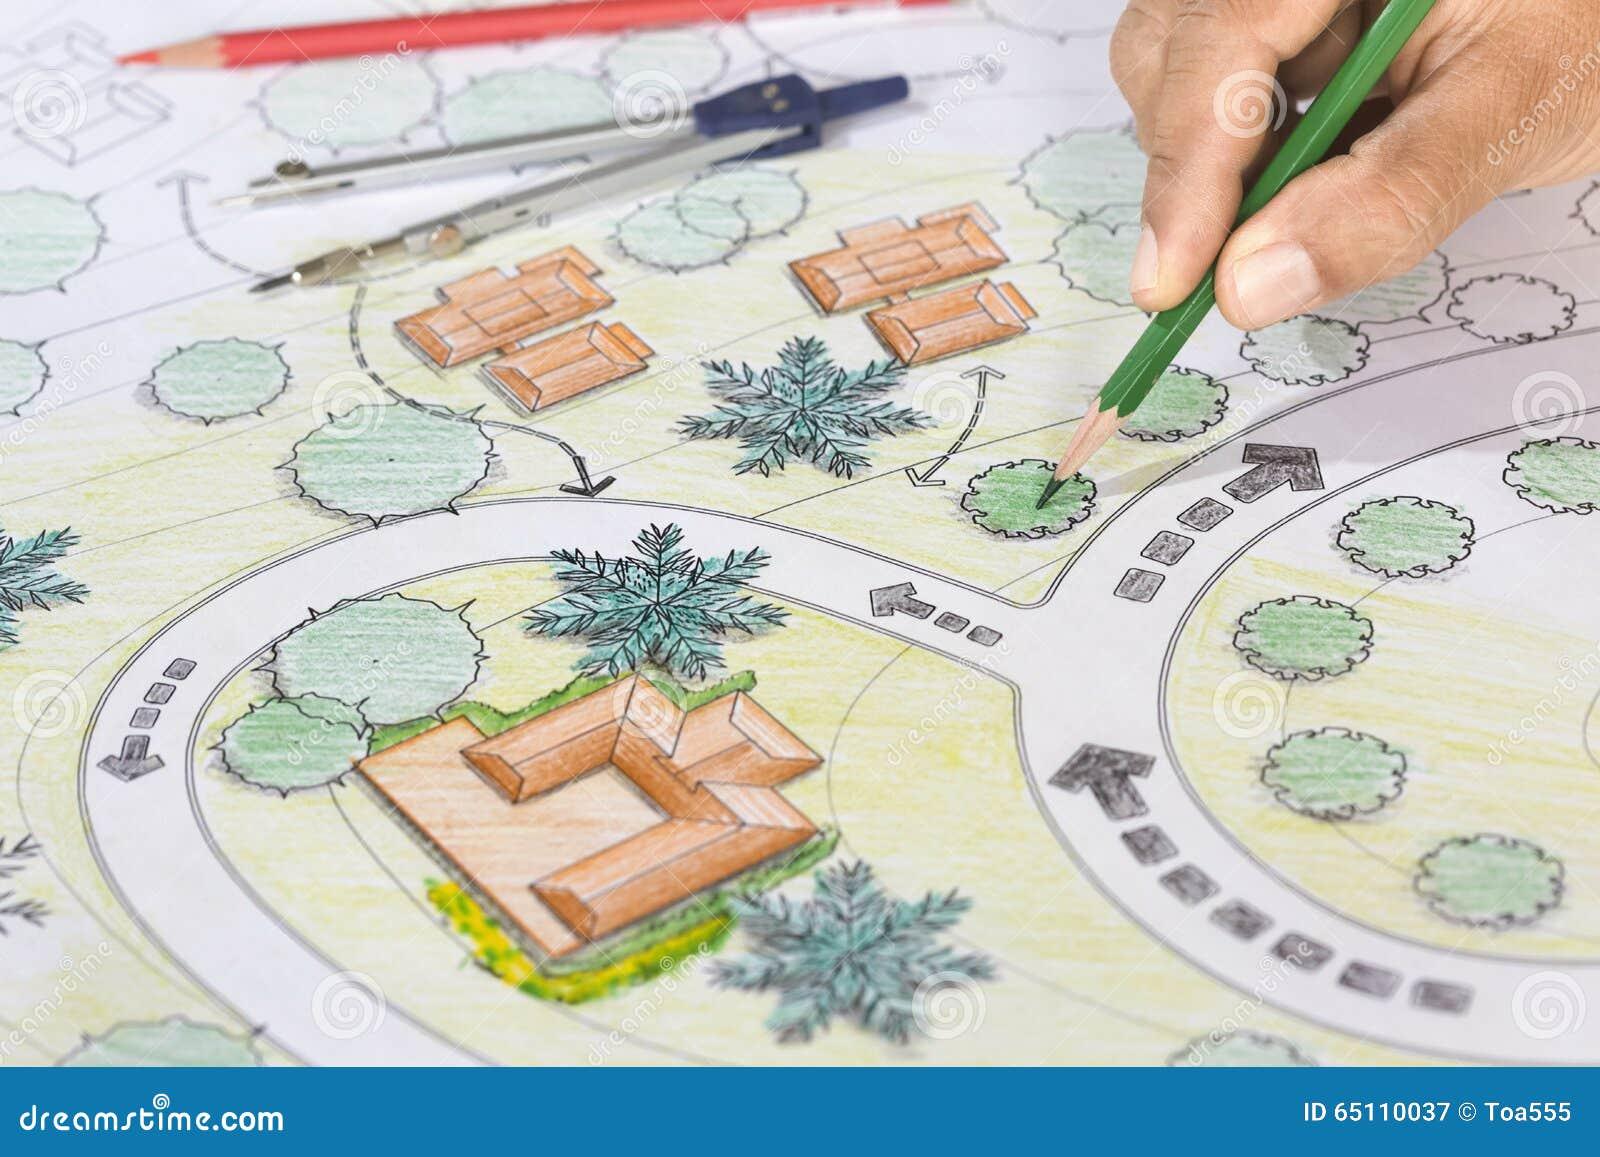 LandskapsarkitektDesigns Blueprints For semesterort